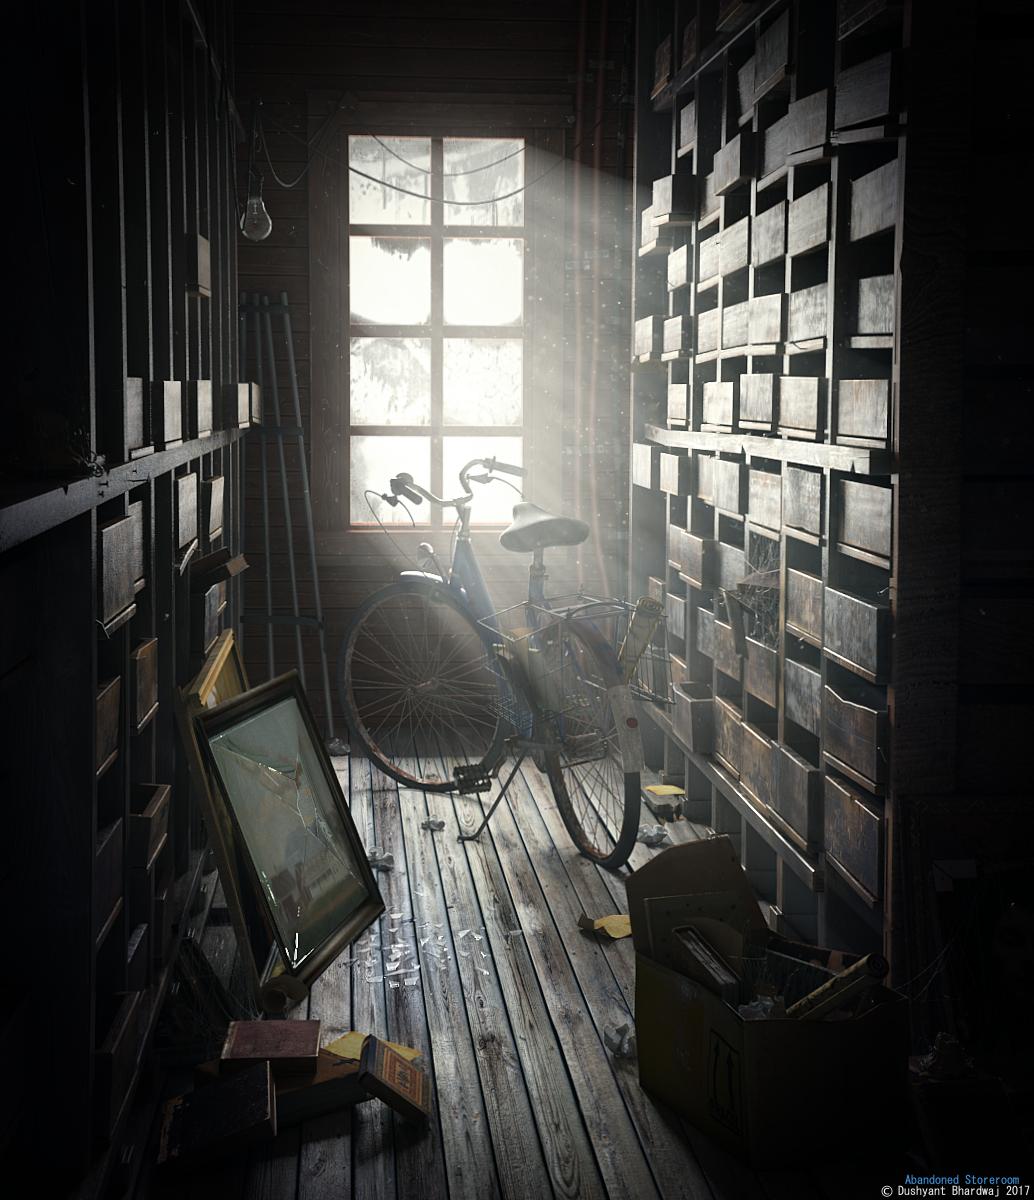 Abandoned Storeroom by Dushyant20b